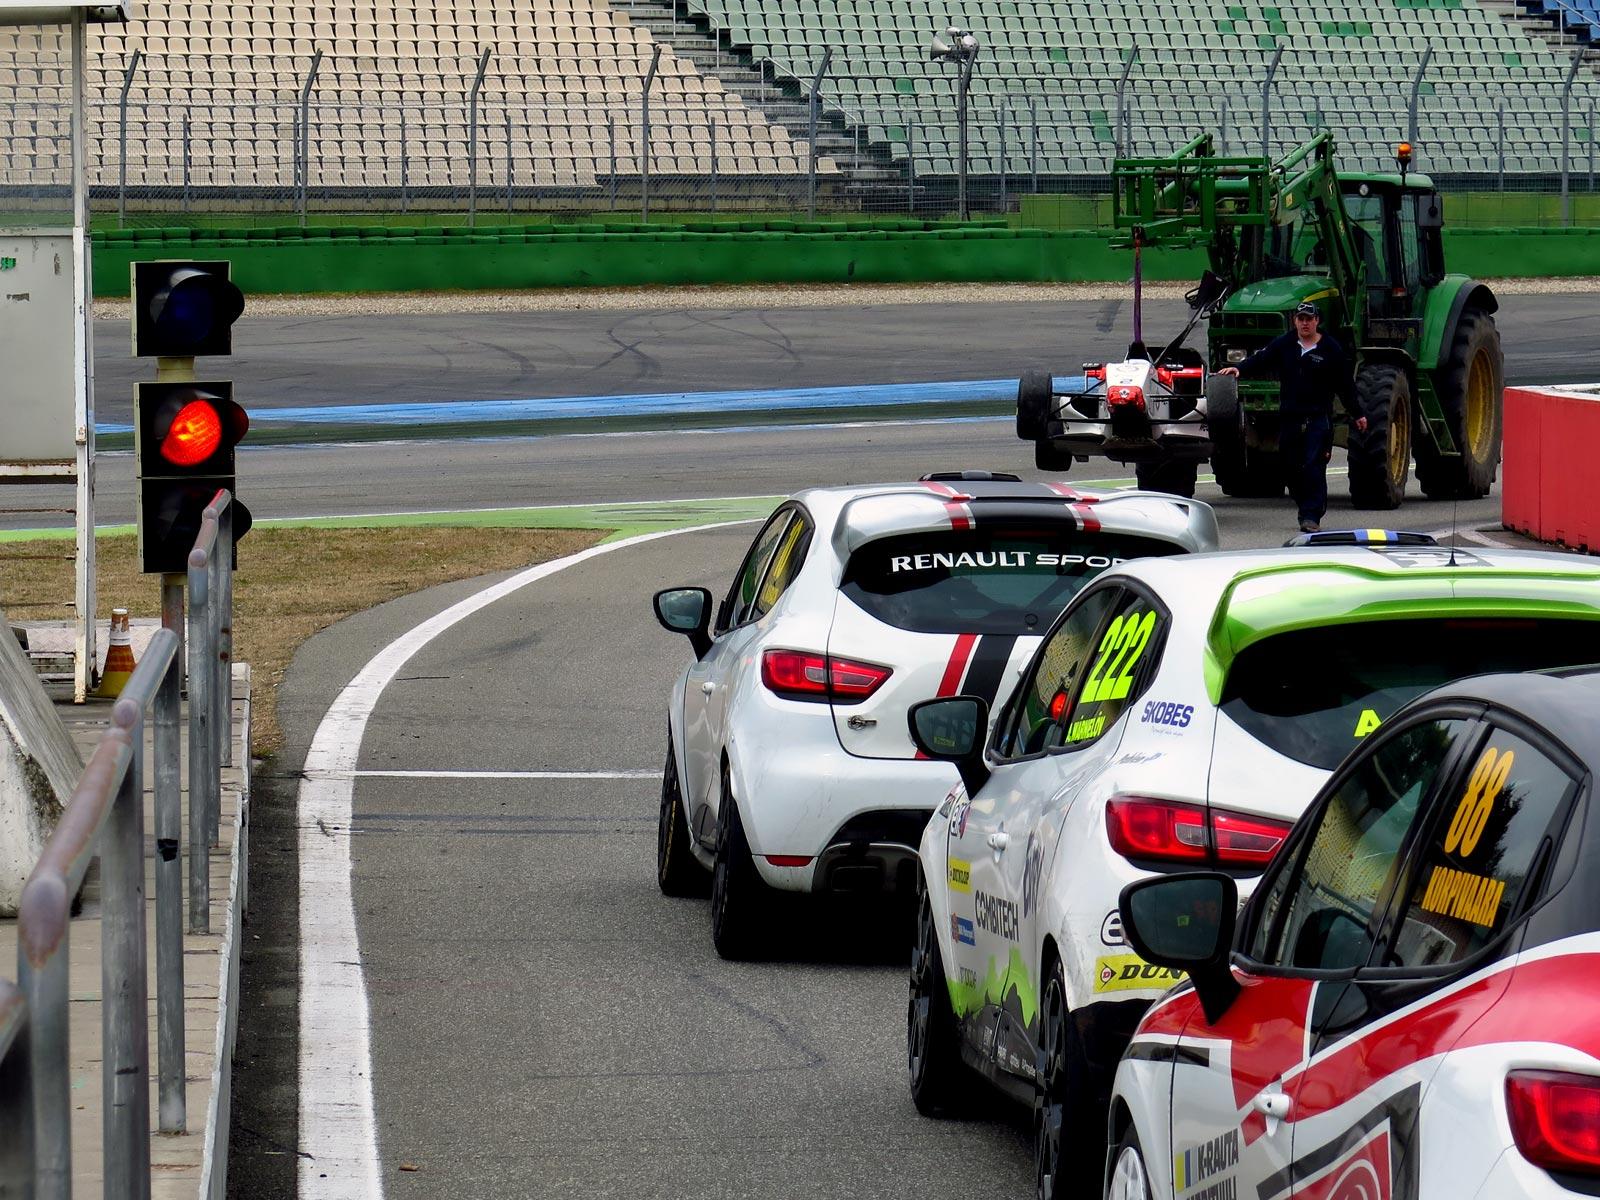 Experion Racing Team i pit lane på racingbana Hockenhiemring f